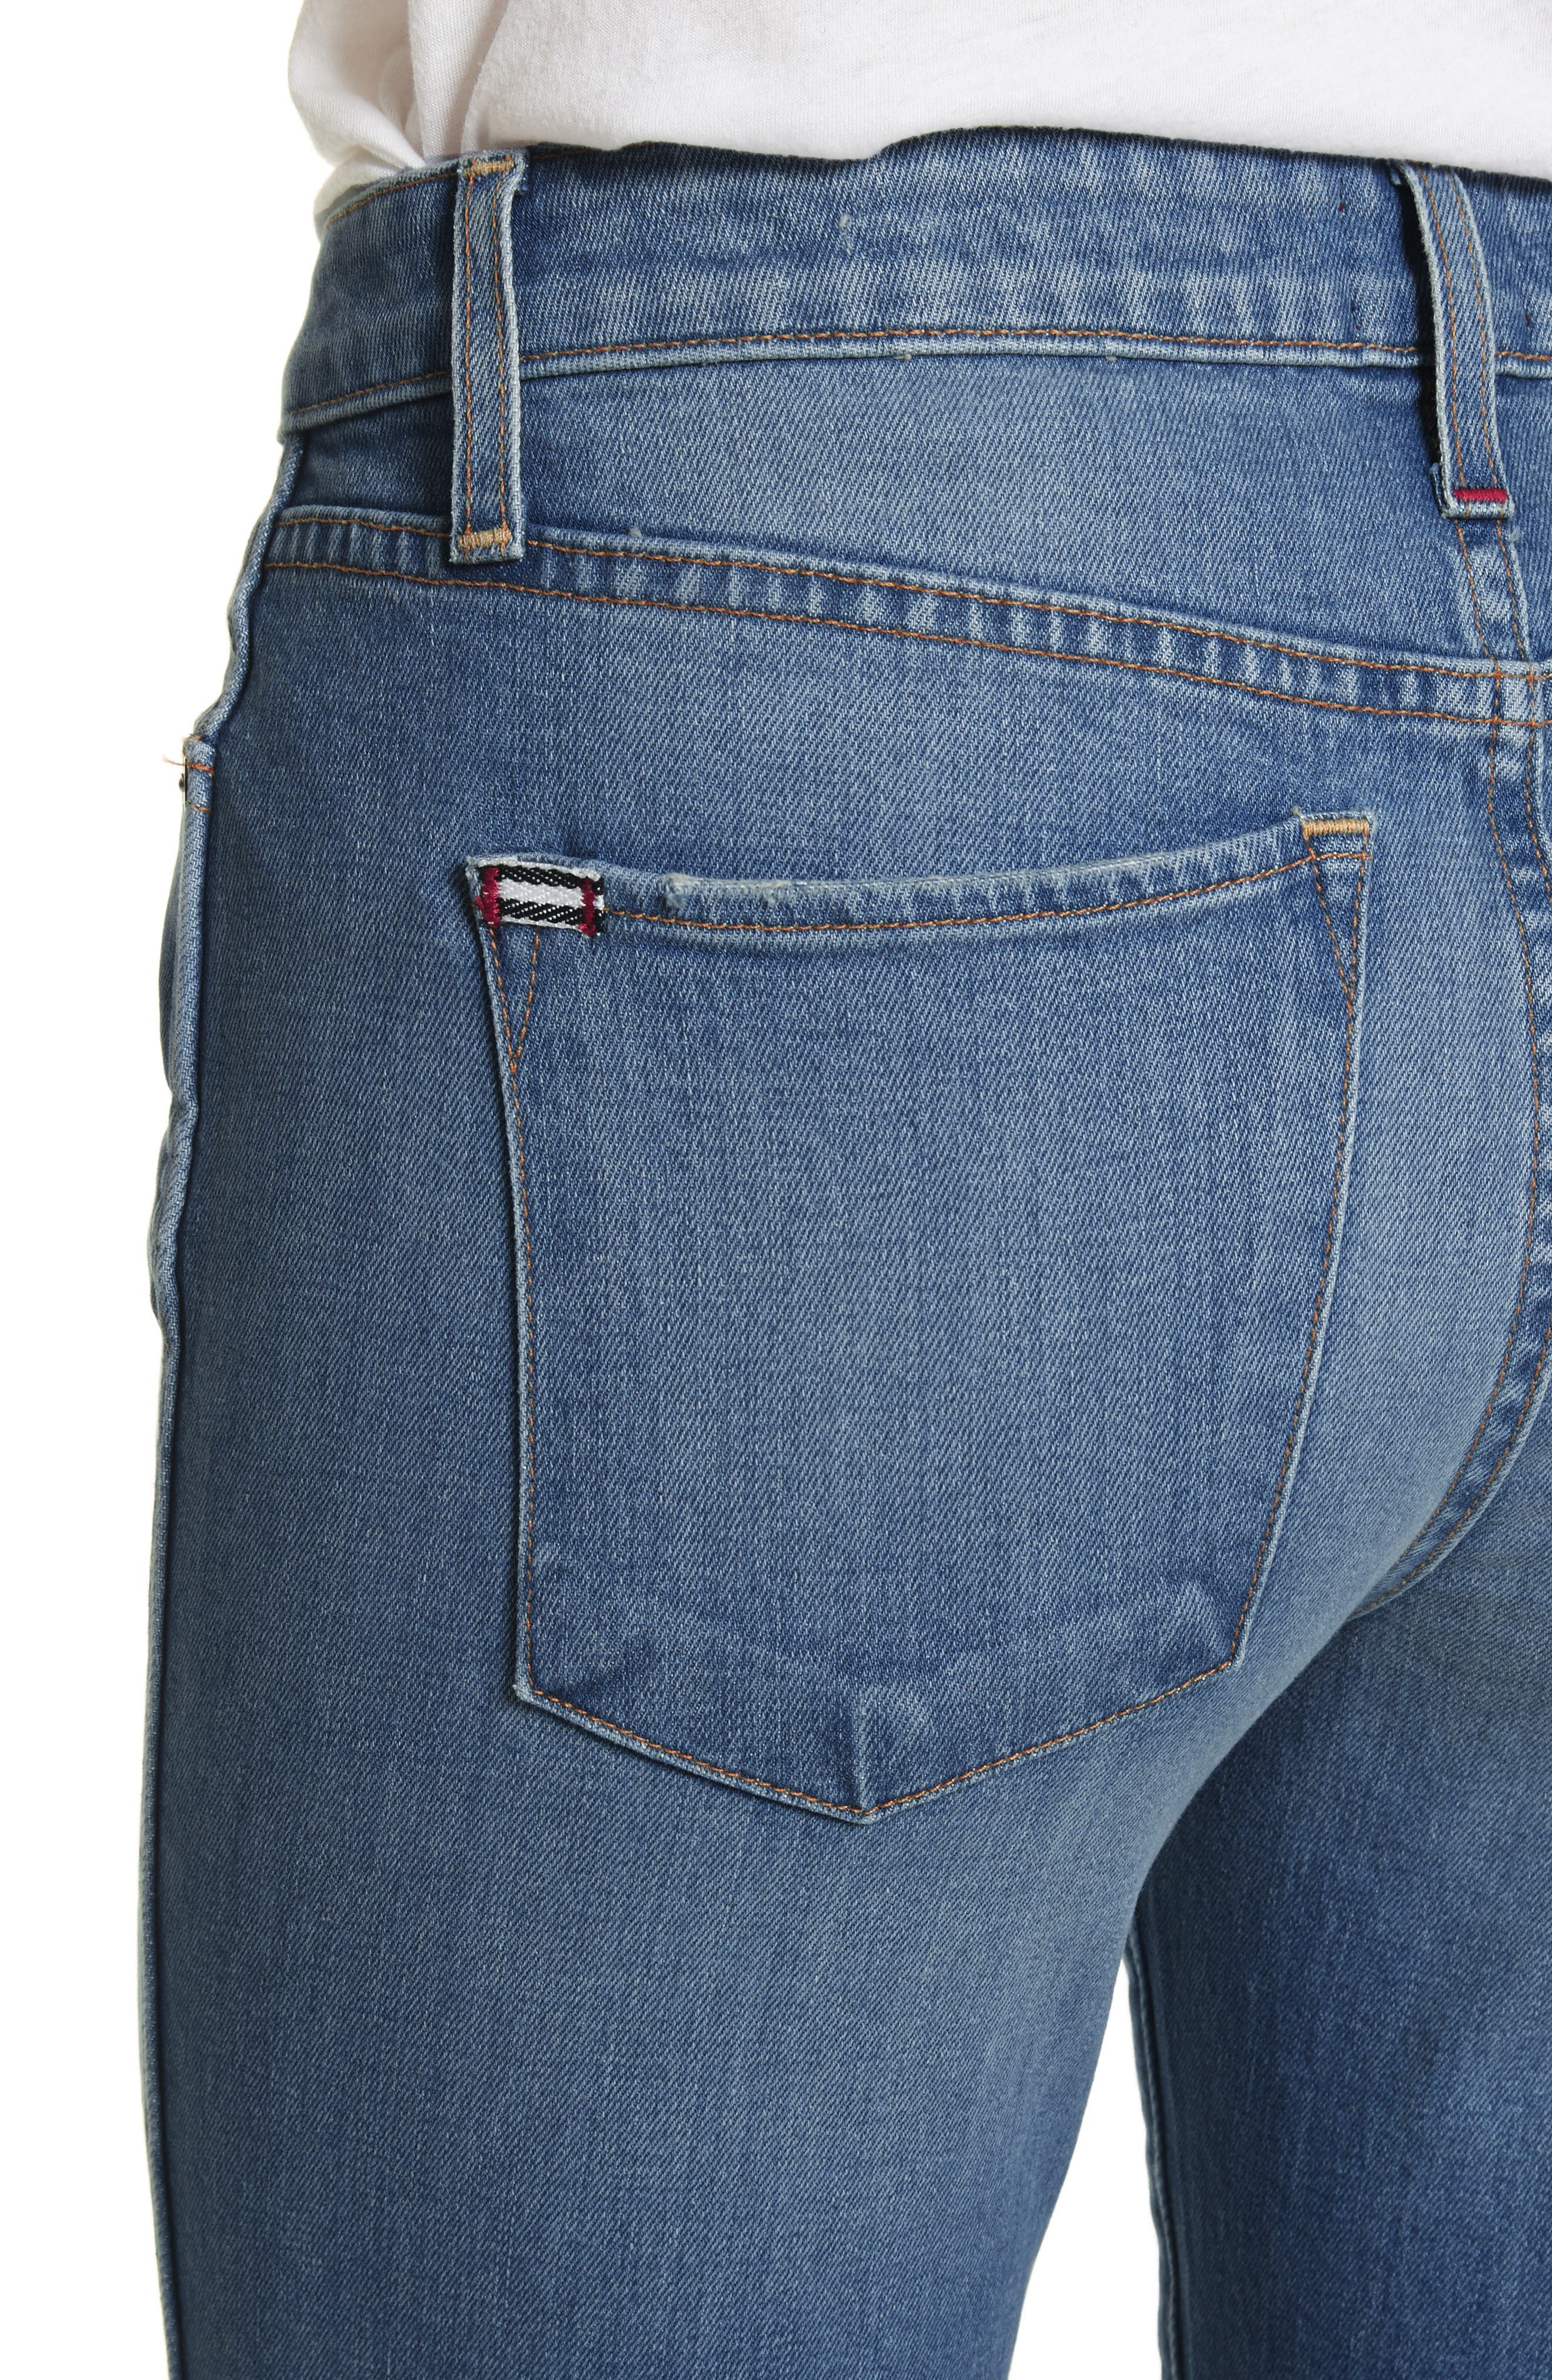 AO.LA Good Ankle Skinny Jeans,                             Alternate thumbnail 4, color,                             Sweet Emotion